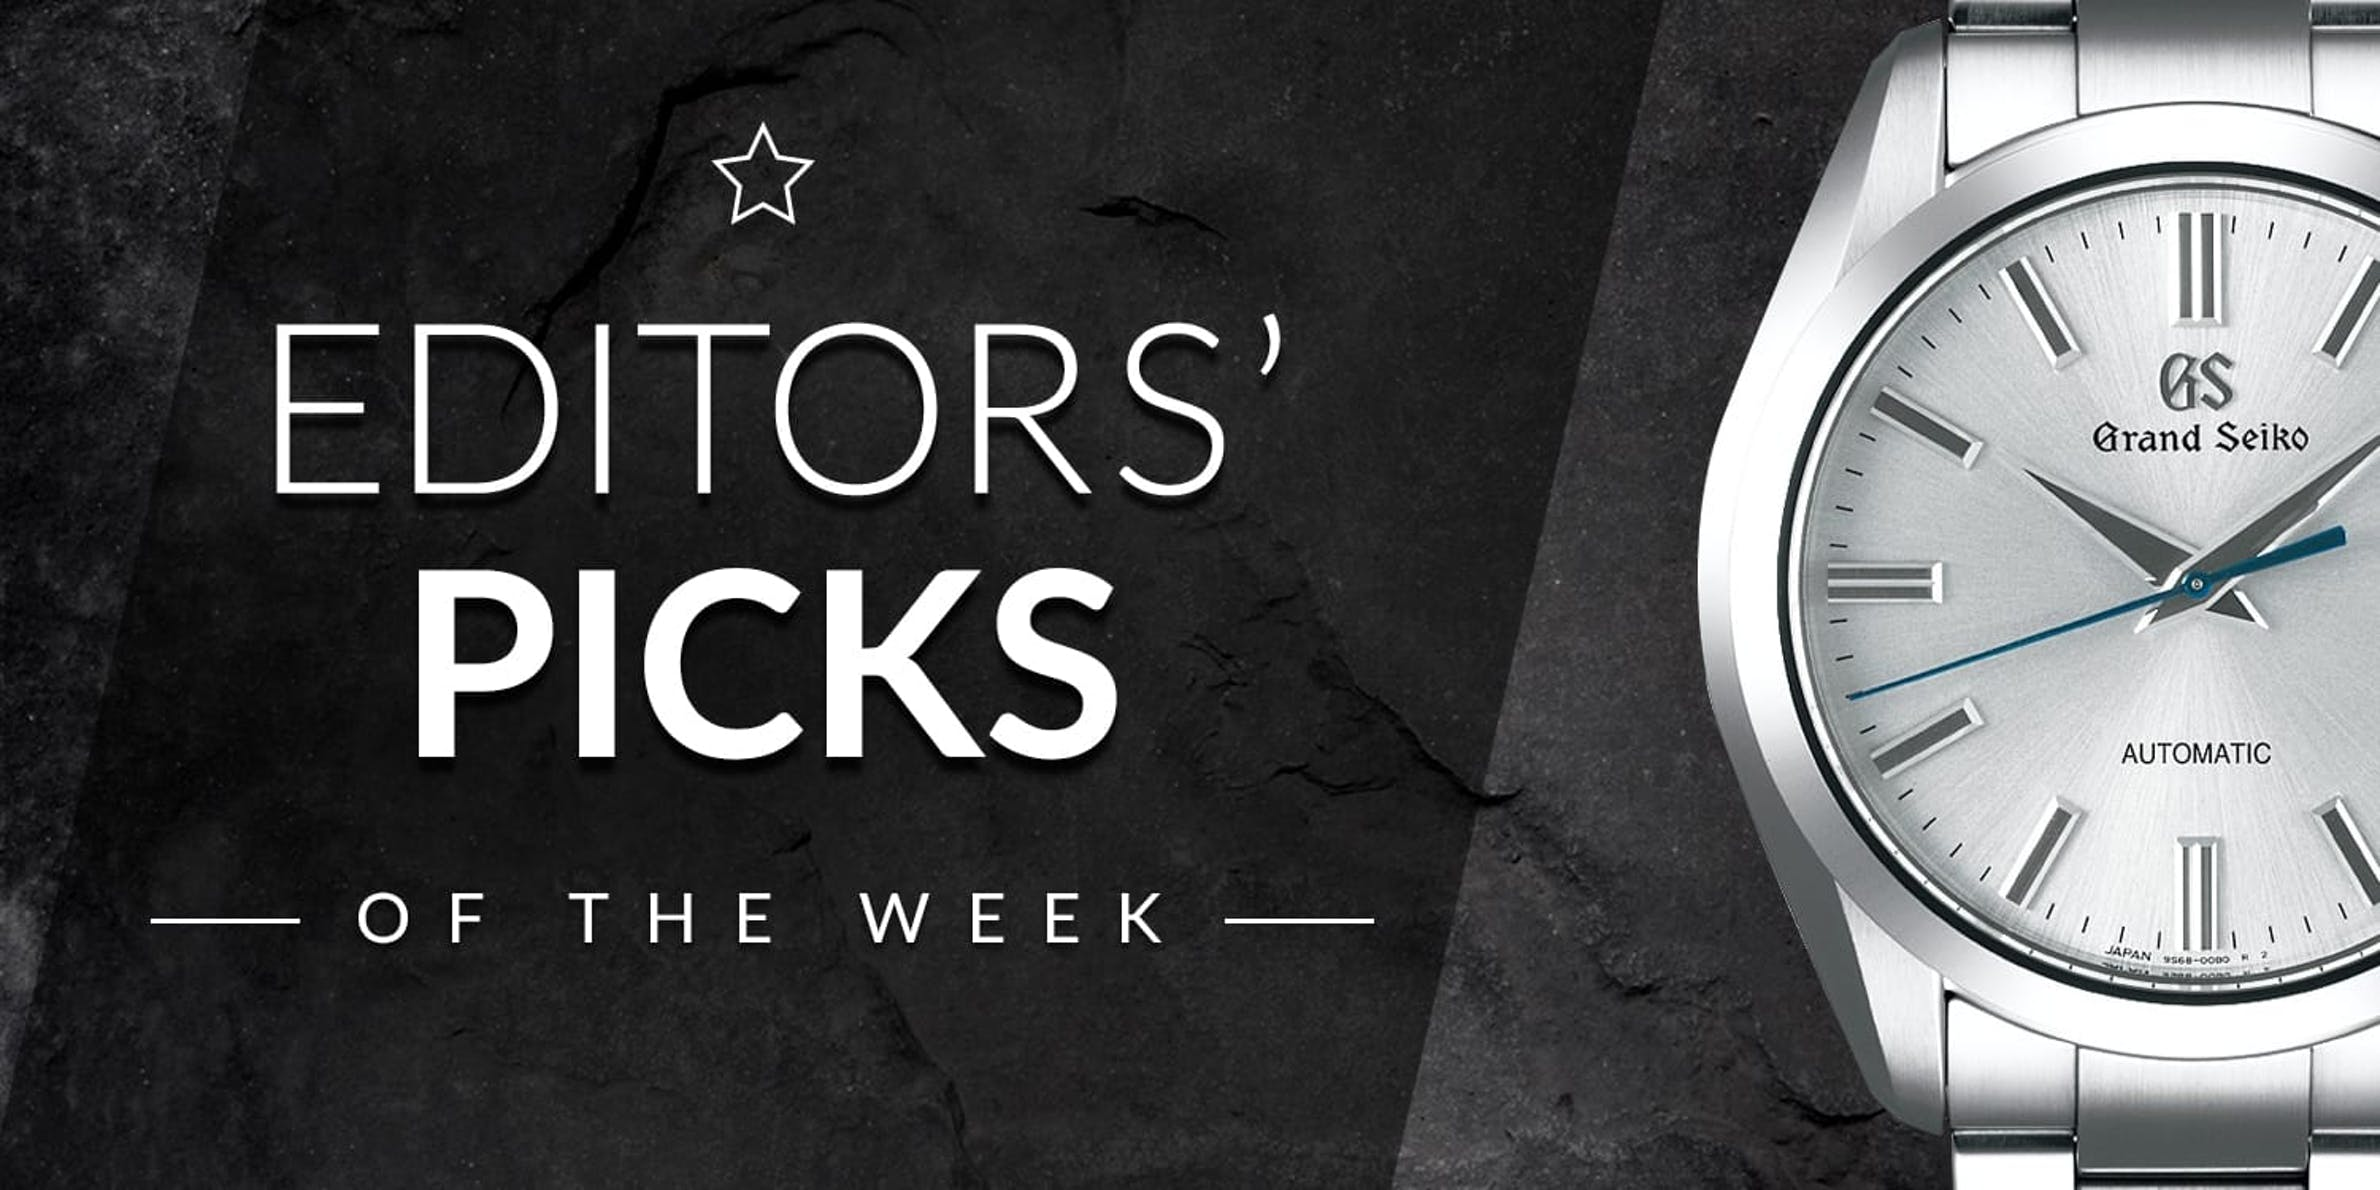 Editors' Picks of the Week: TAG Heuer, Hamilton, and Grand Seiko